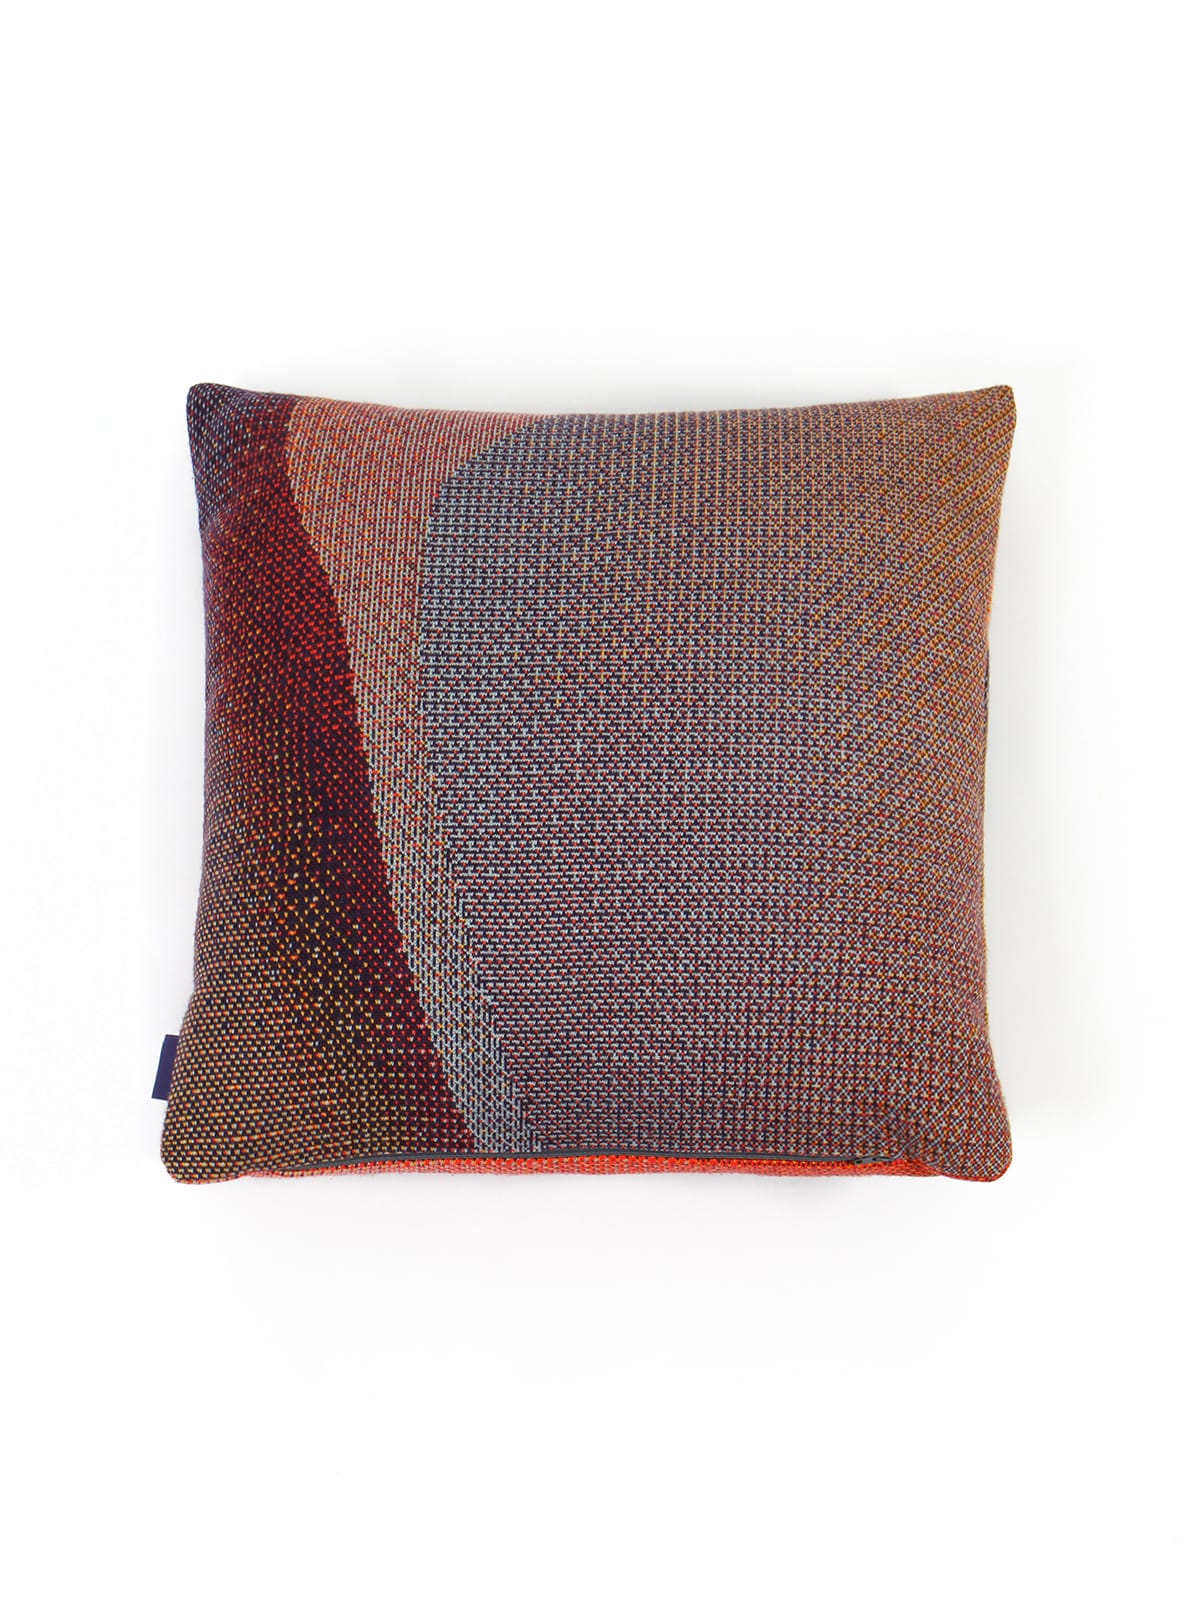 Knitted Cushion 50x50 Musselshell No2 - Merino Wool hinten